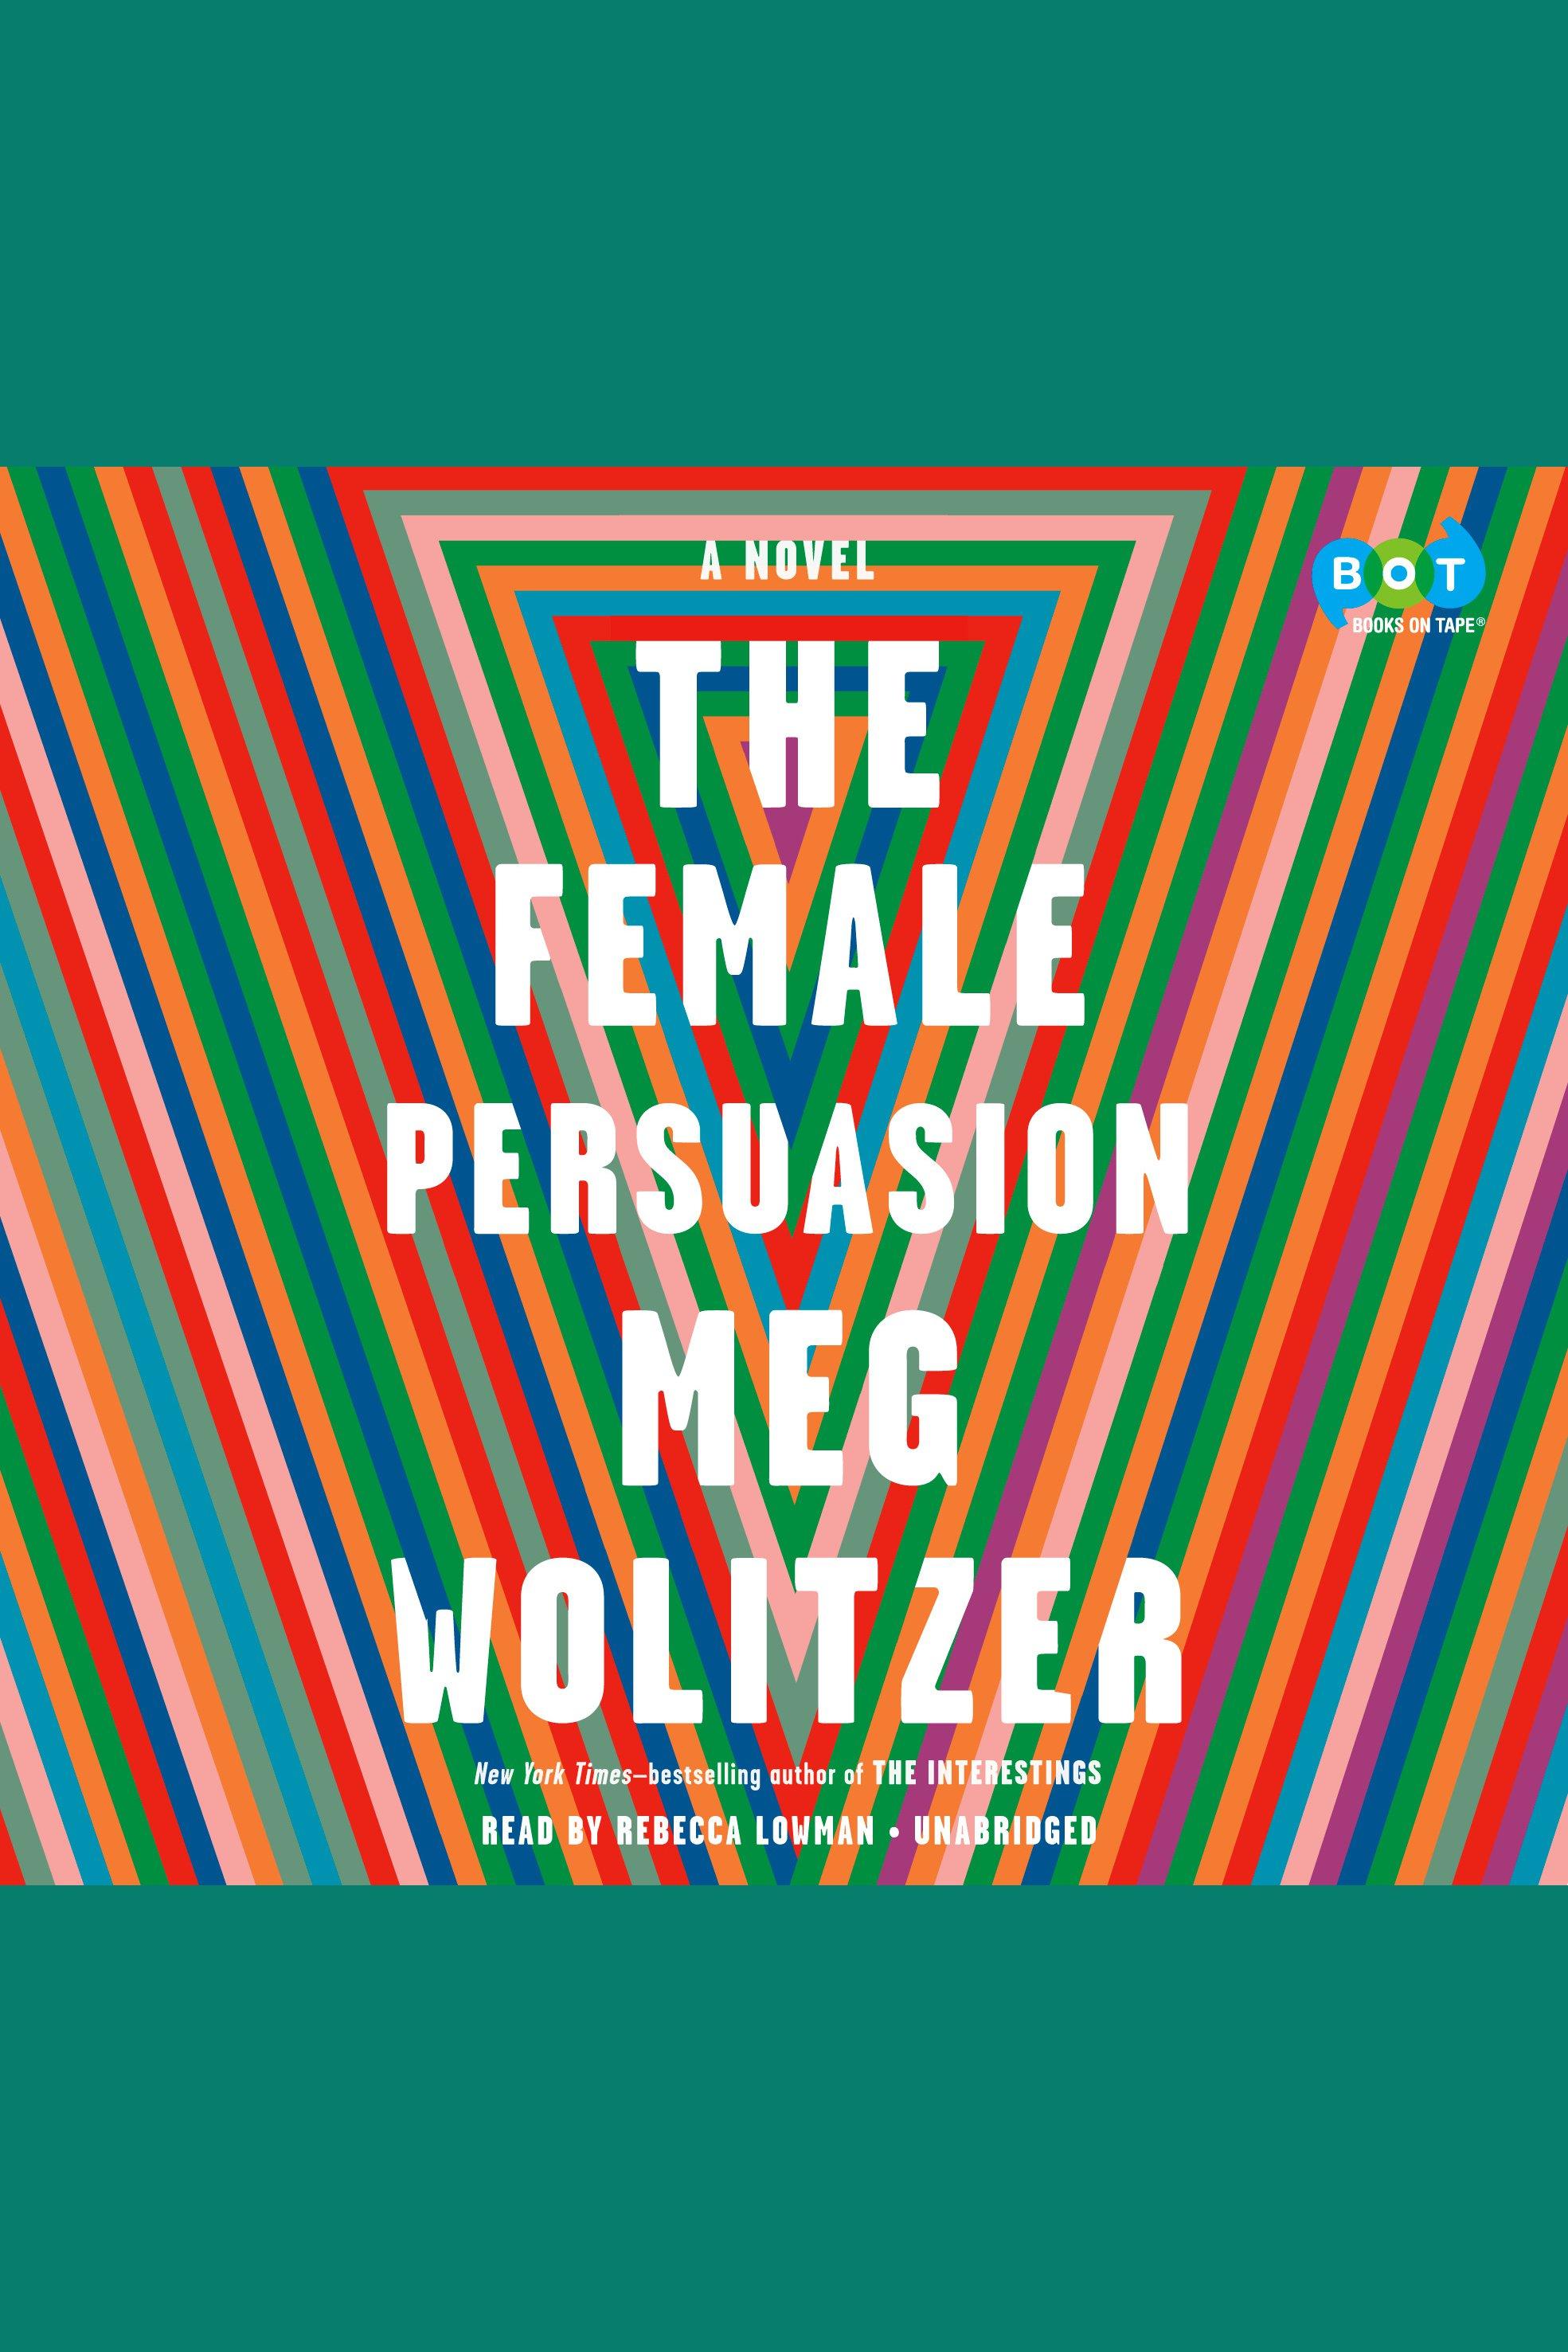 The female persuasion cover image